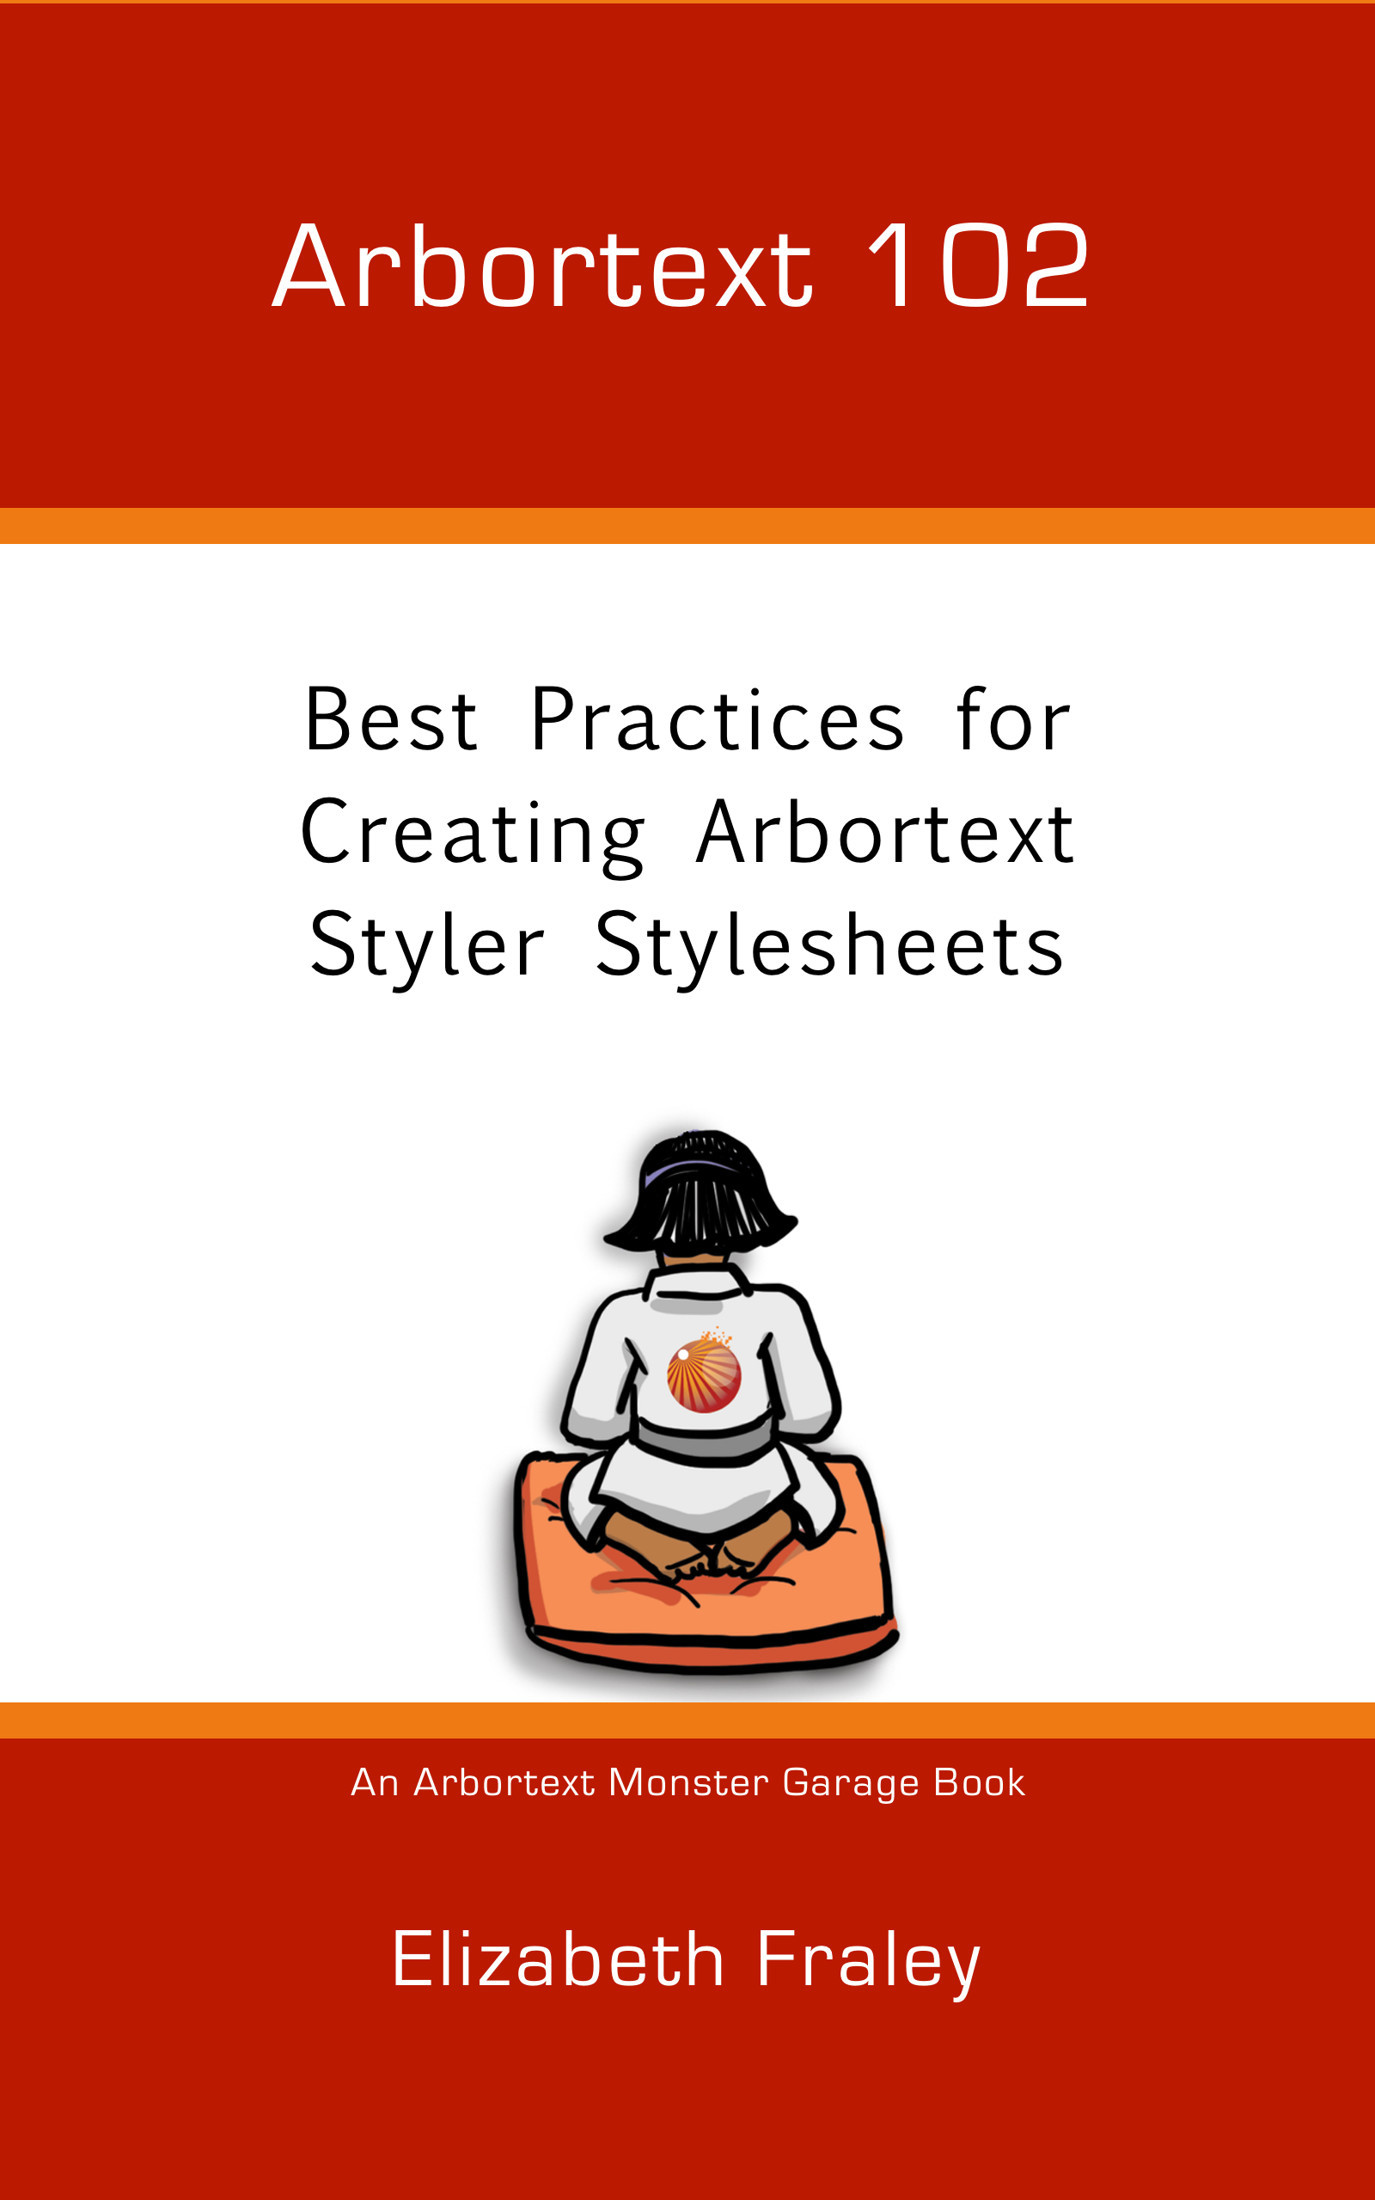 Arbortext 102: Best Practices for Creating Arbortext Styler Stylesheets (Arbortext Monster Garage, #2)